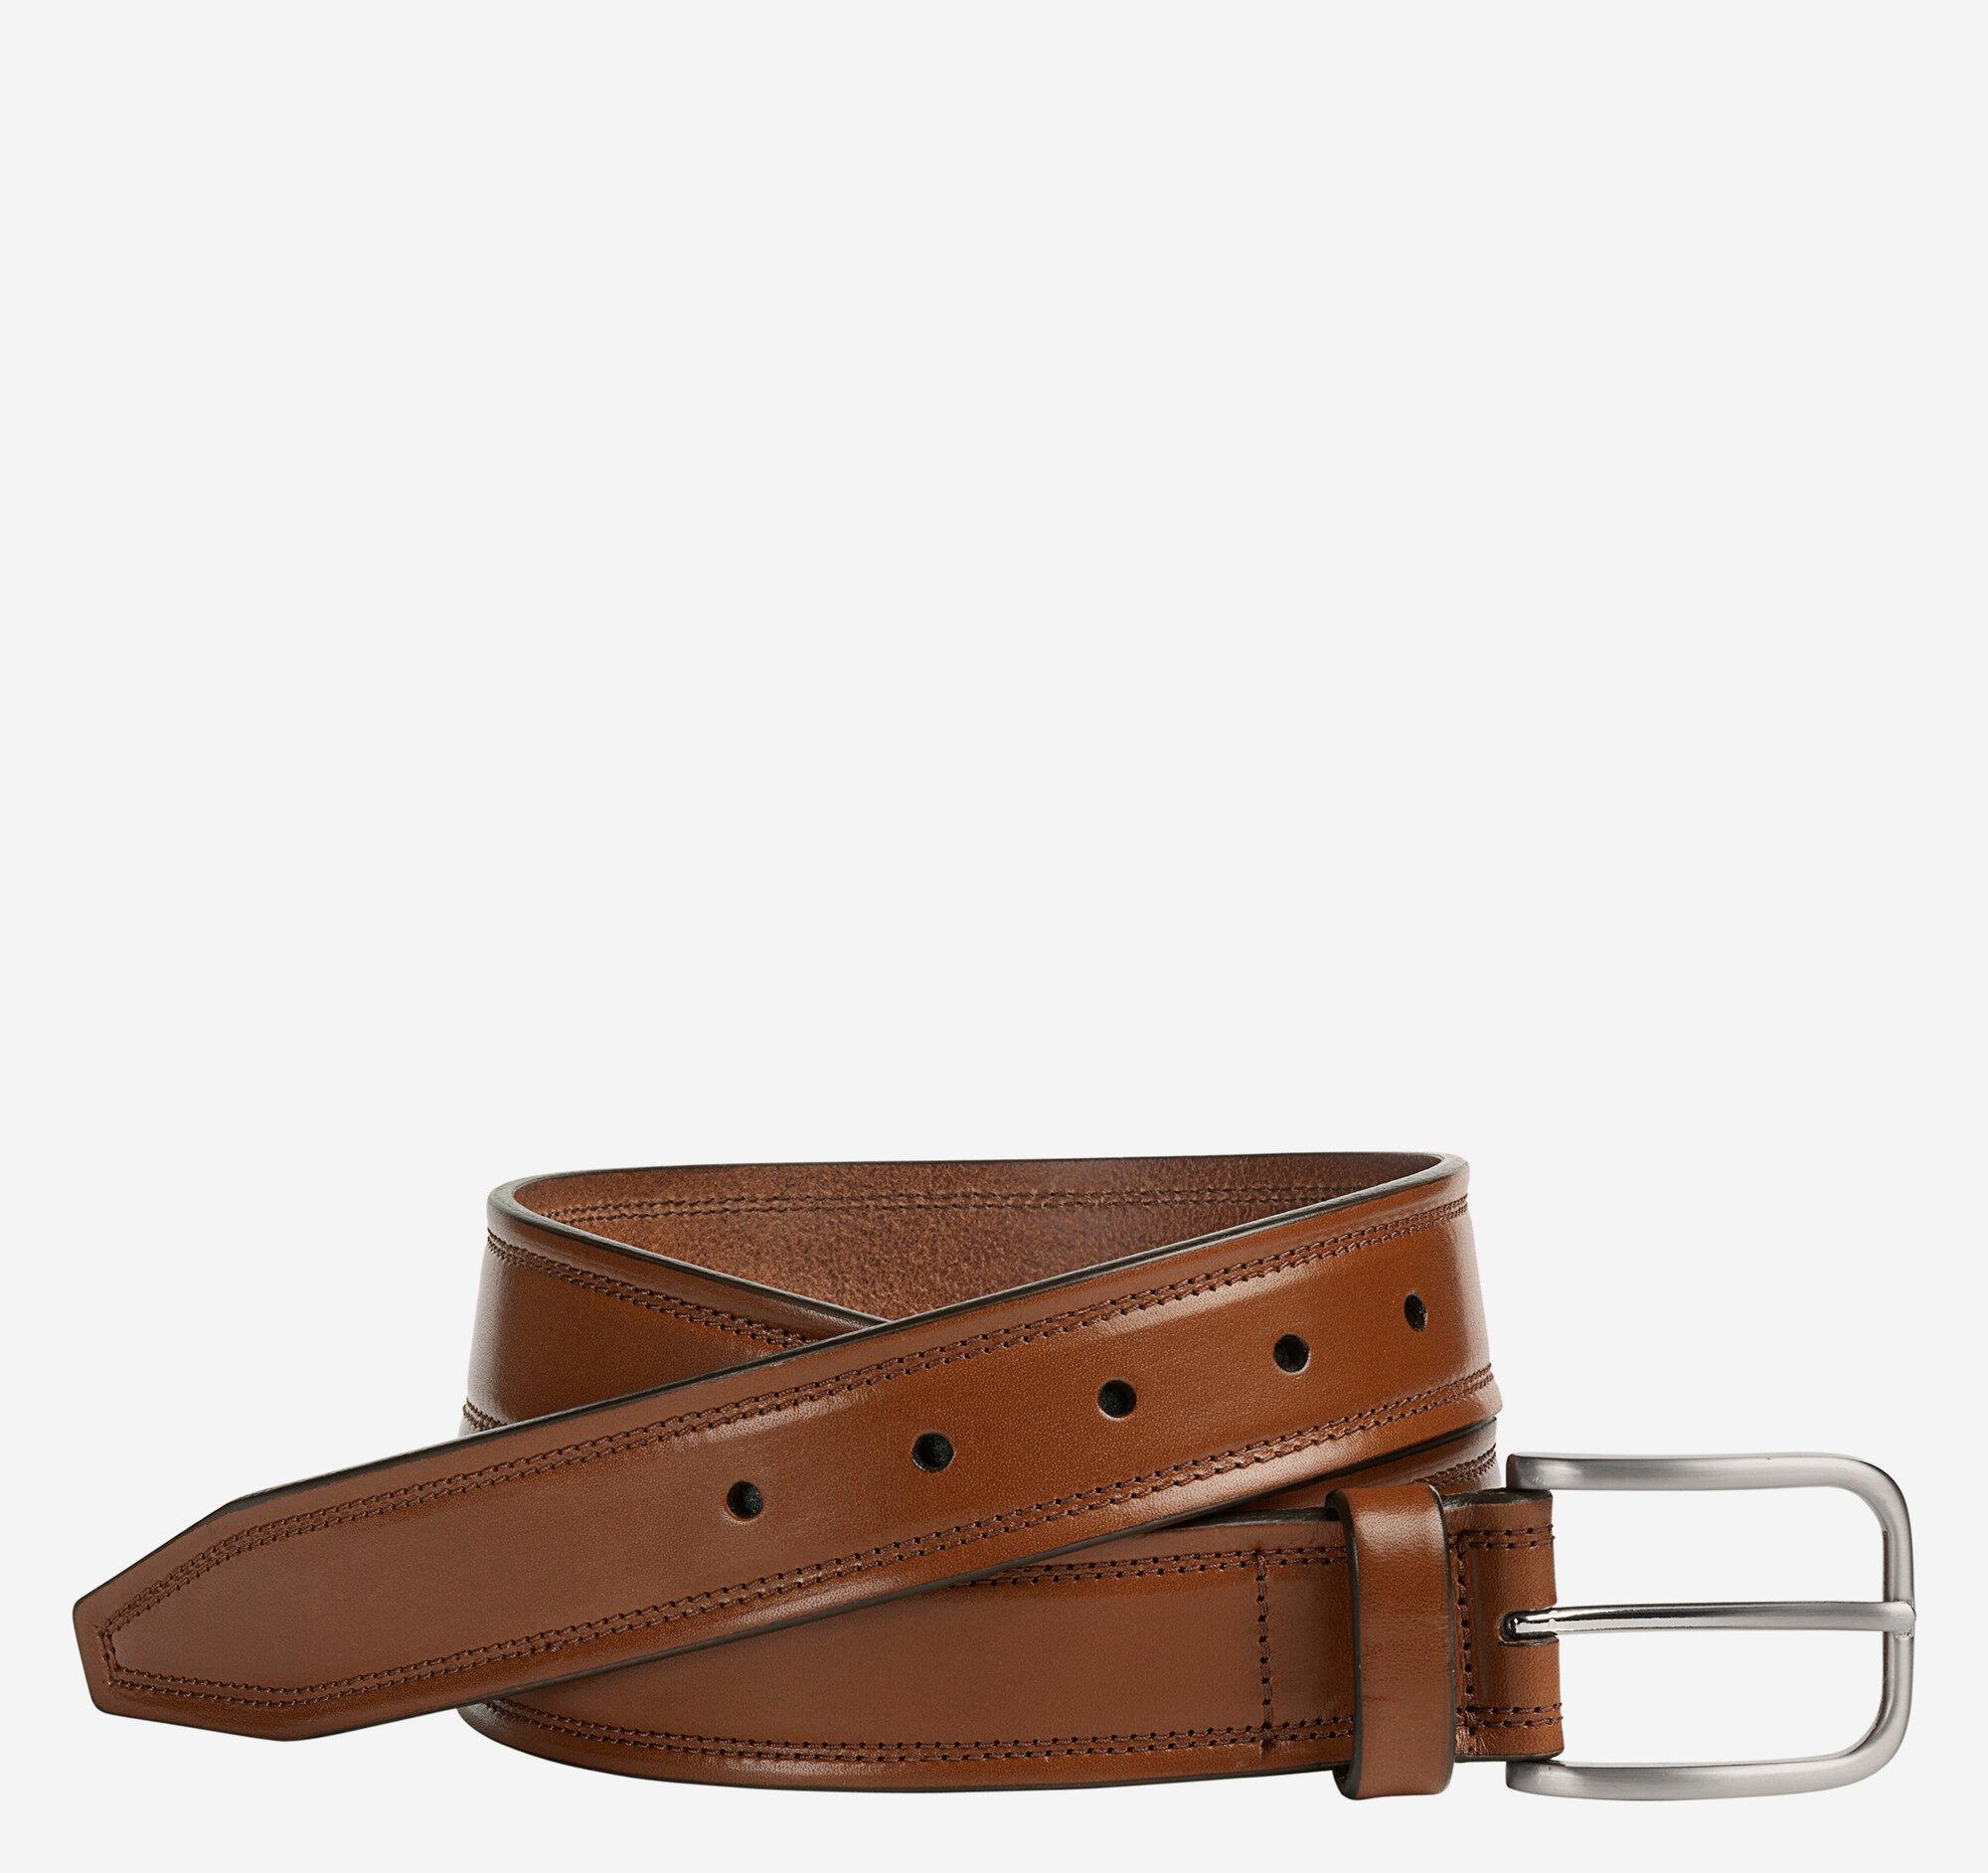 Johnston & Murphy Men's Double Self-Stitch Belt - Brown - Size 32